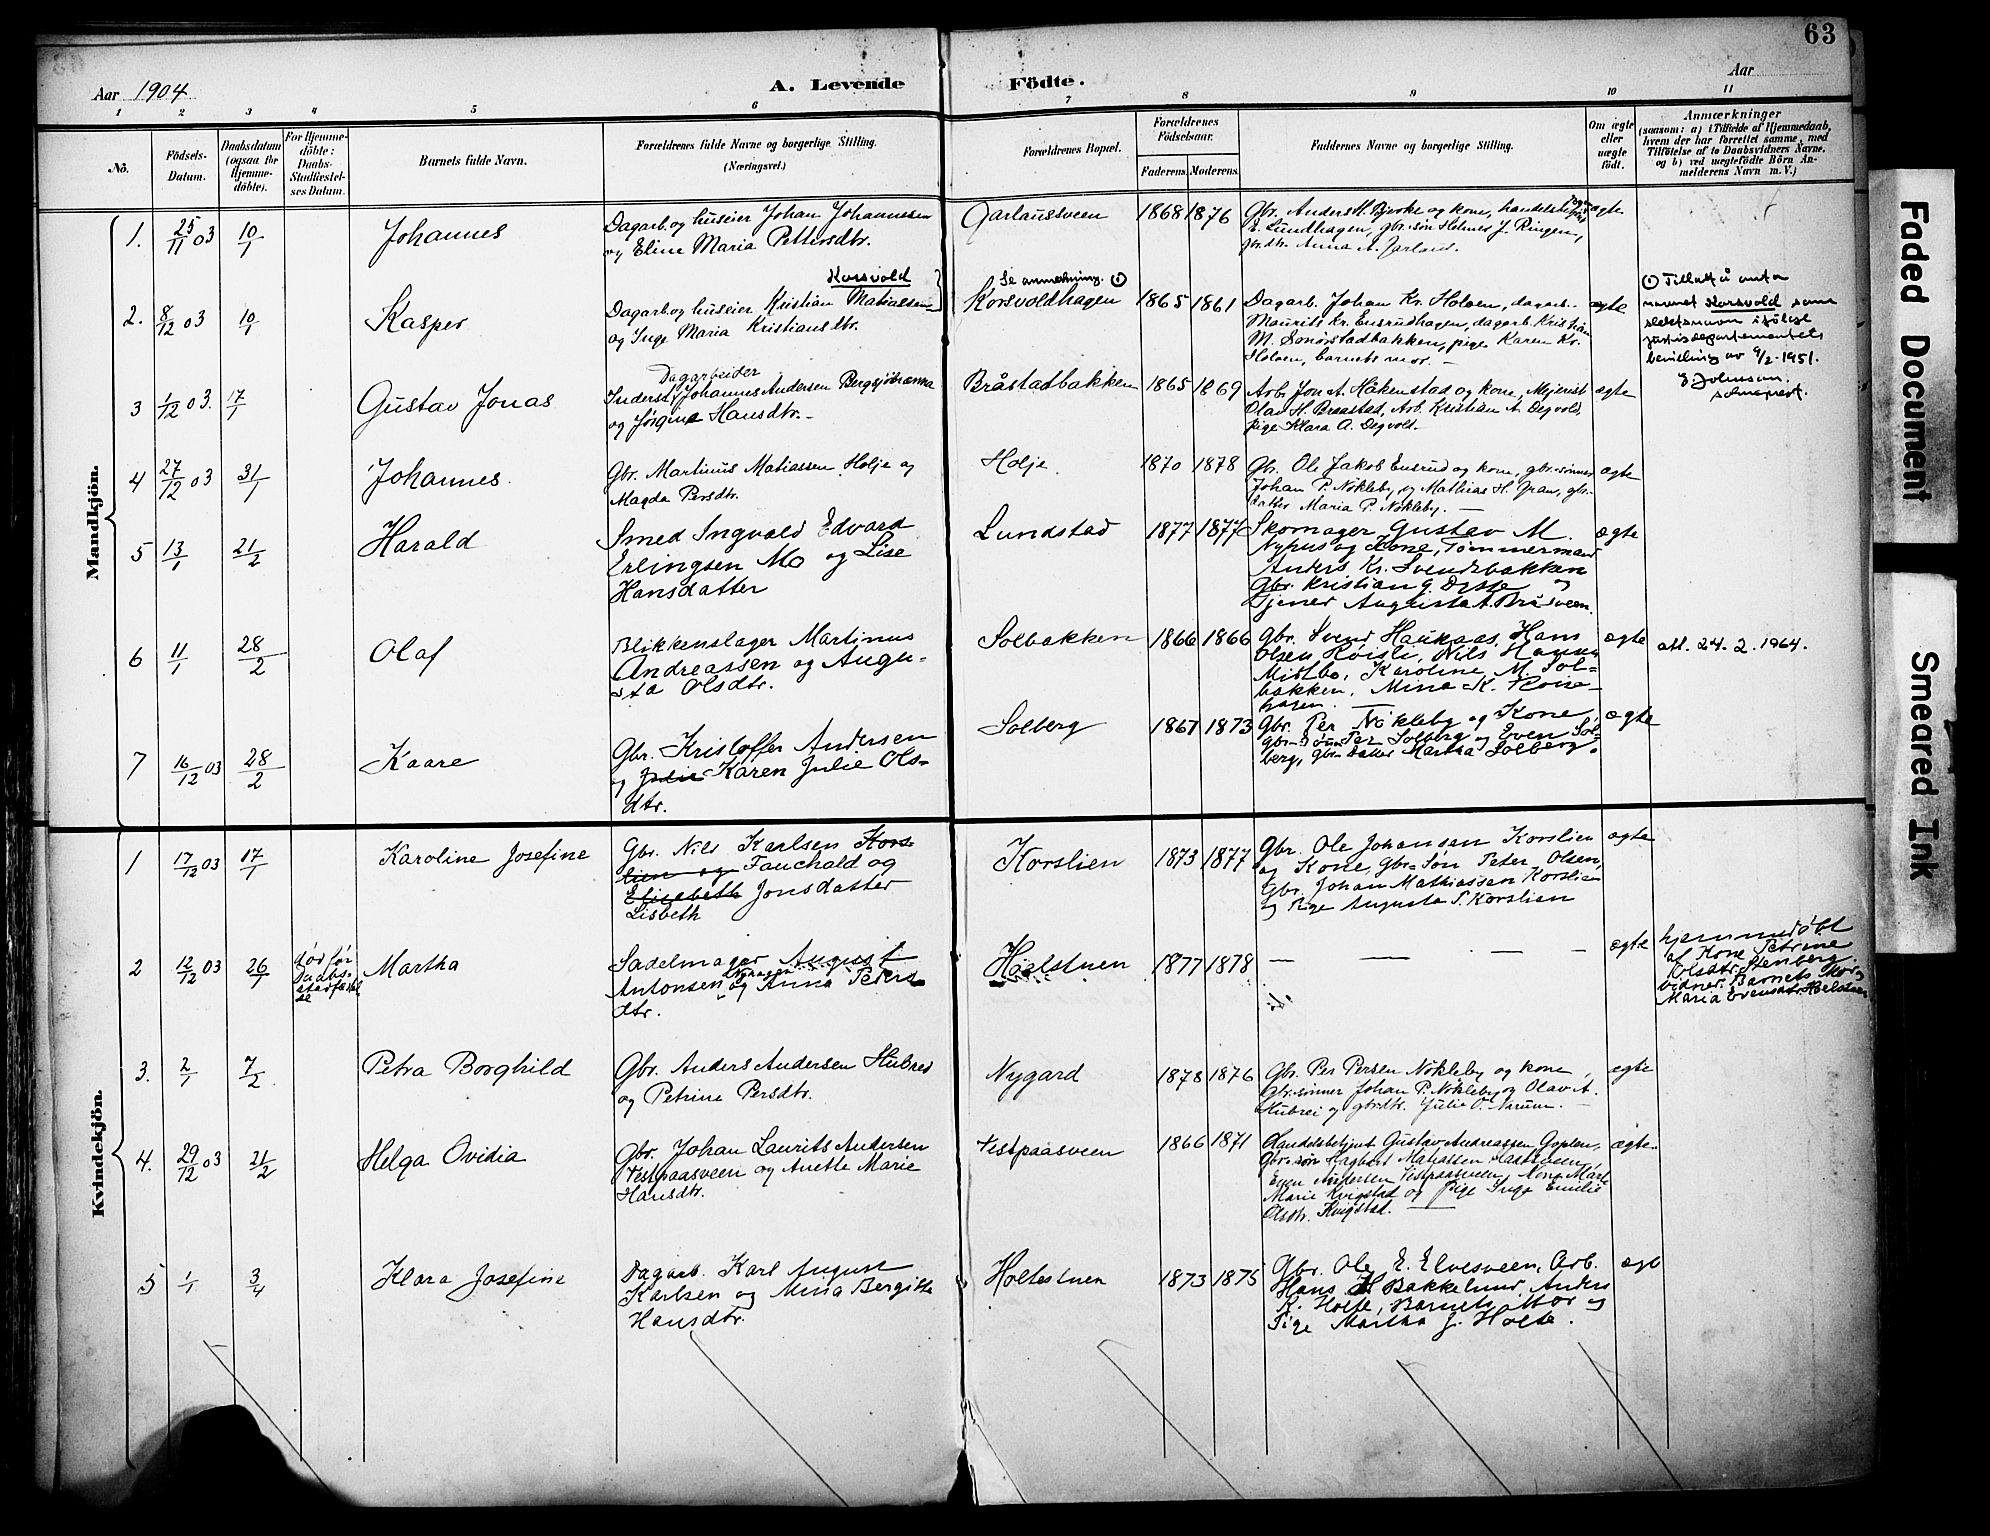 SAH, Vestre Toten prestekontor, H/Ha/Haa/L0013: Ministerialbok nr. 13, 1895-1911, s. 63